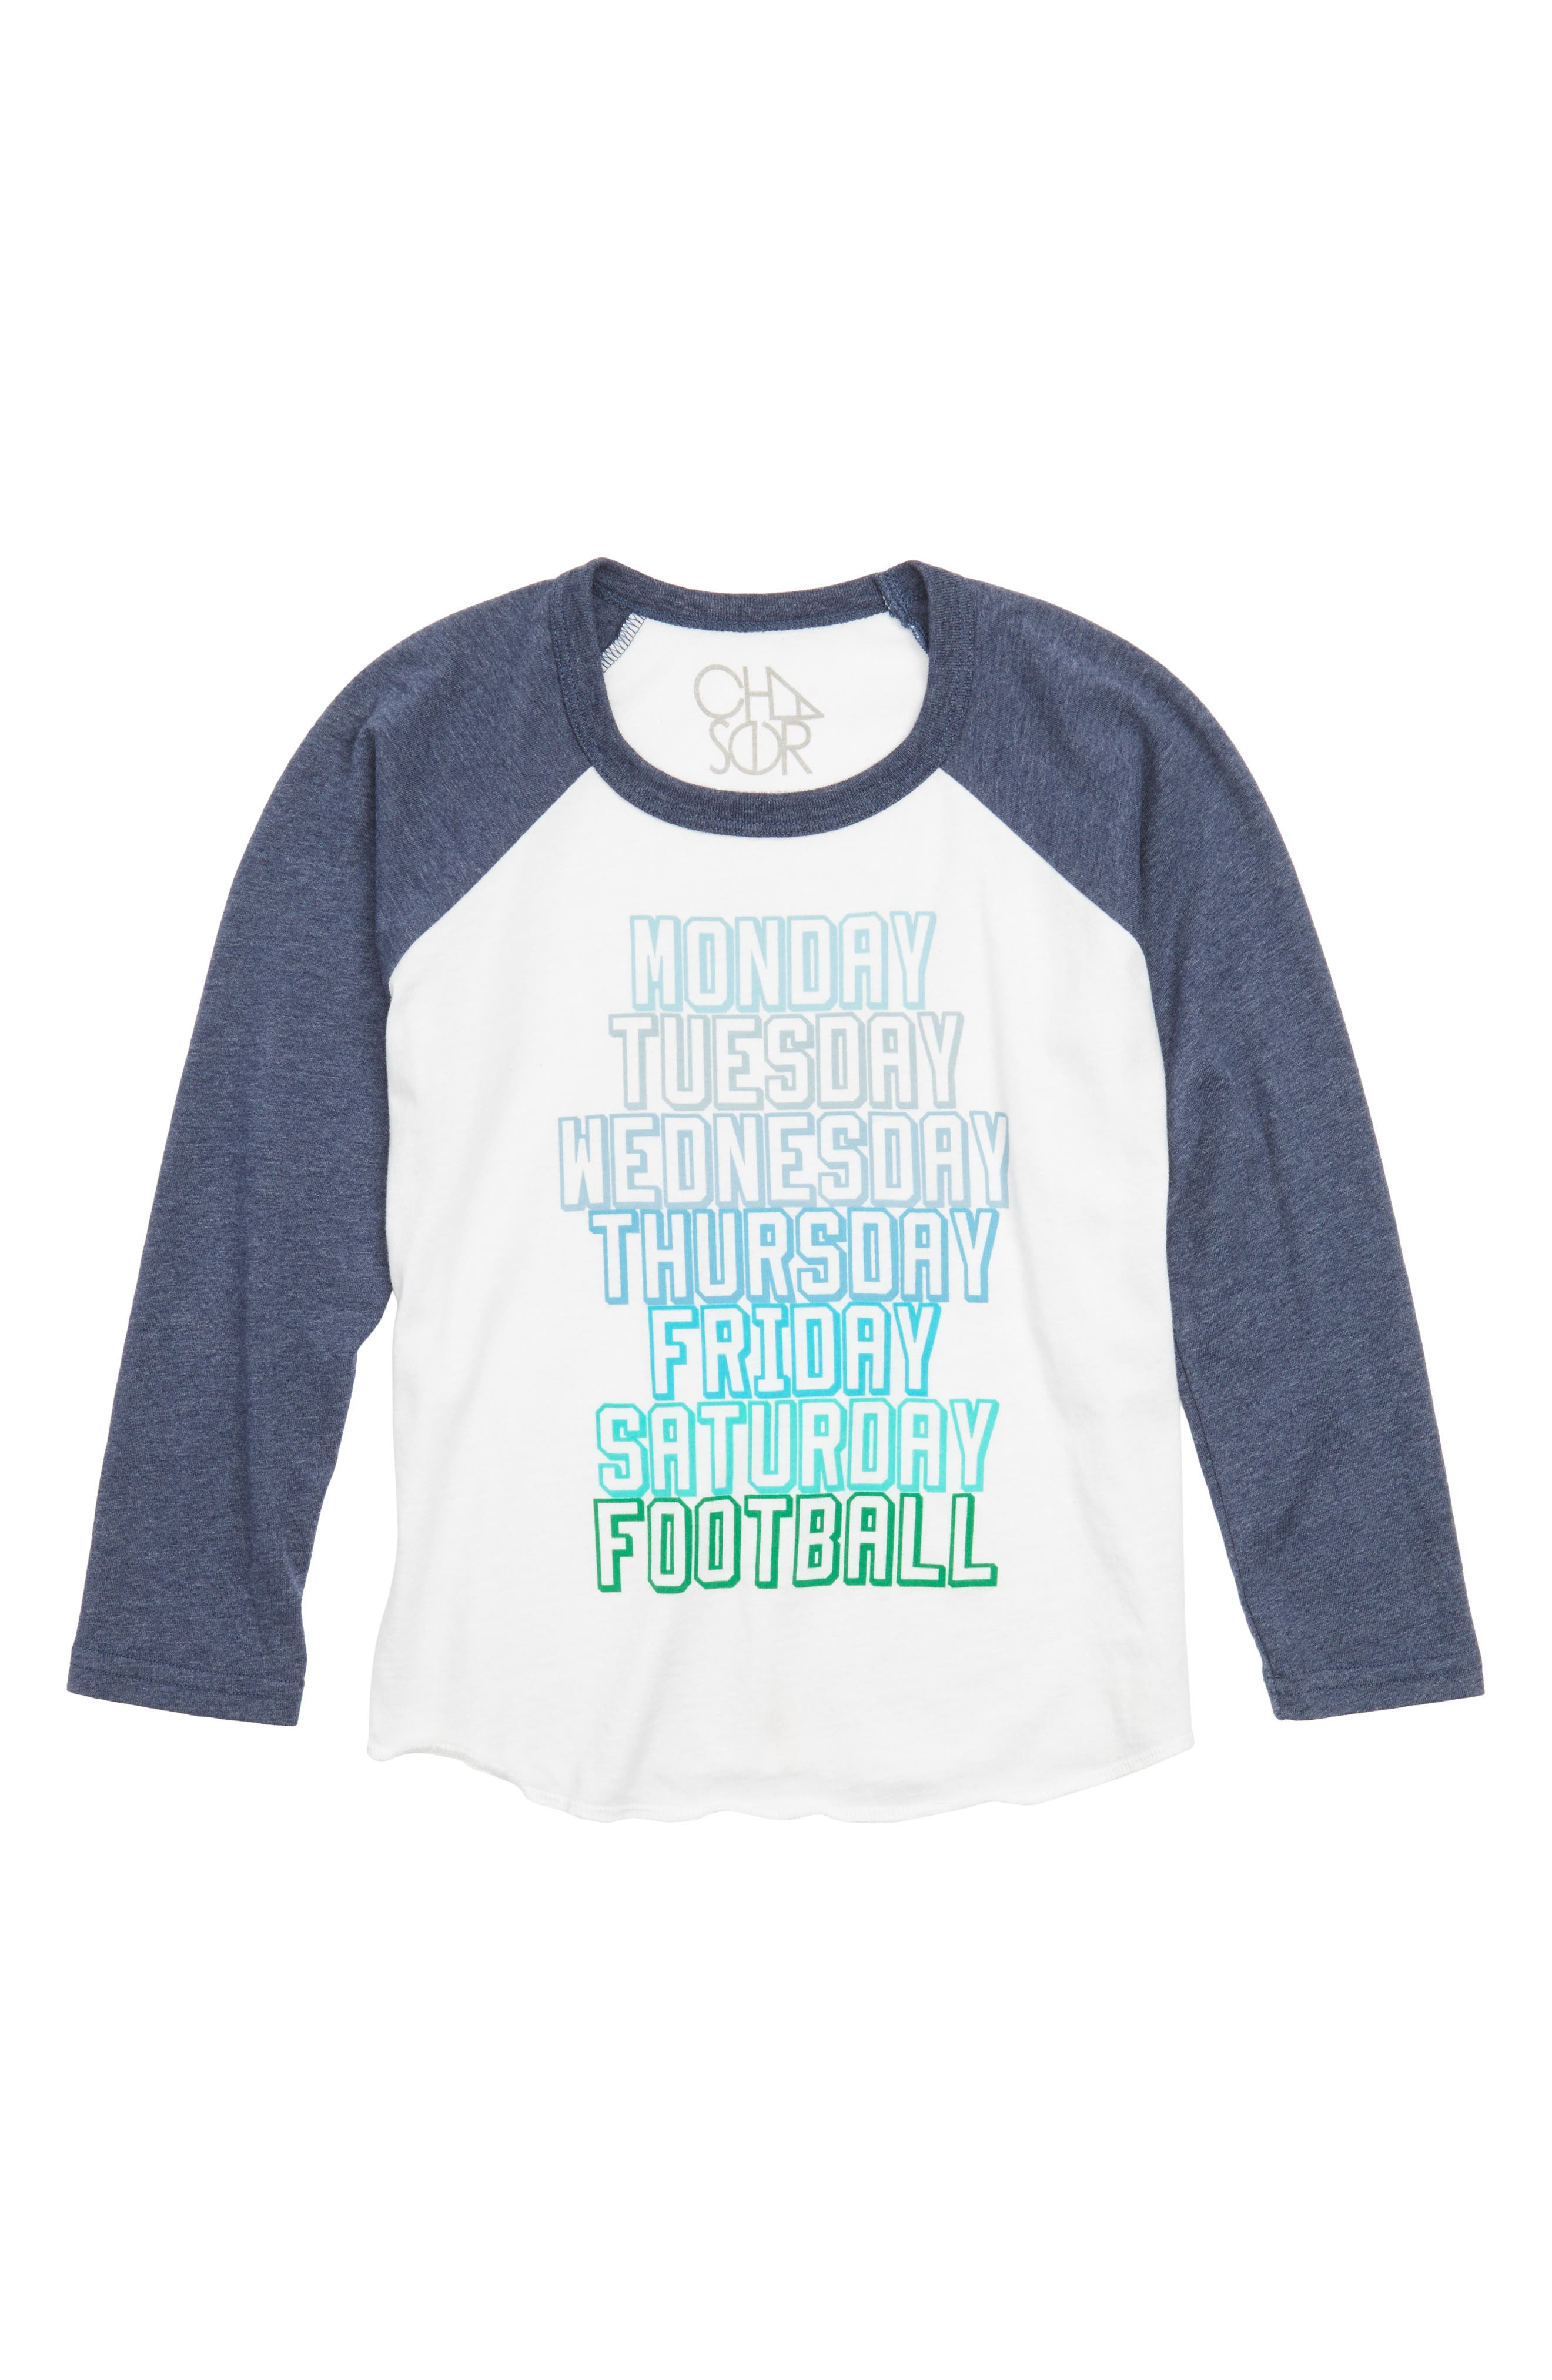 Chaser Sunday Football Long Sleeve Raglan T-Shirt (Toddler Boys, Little Boys & Big Boys)